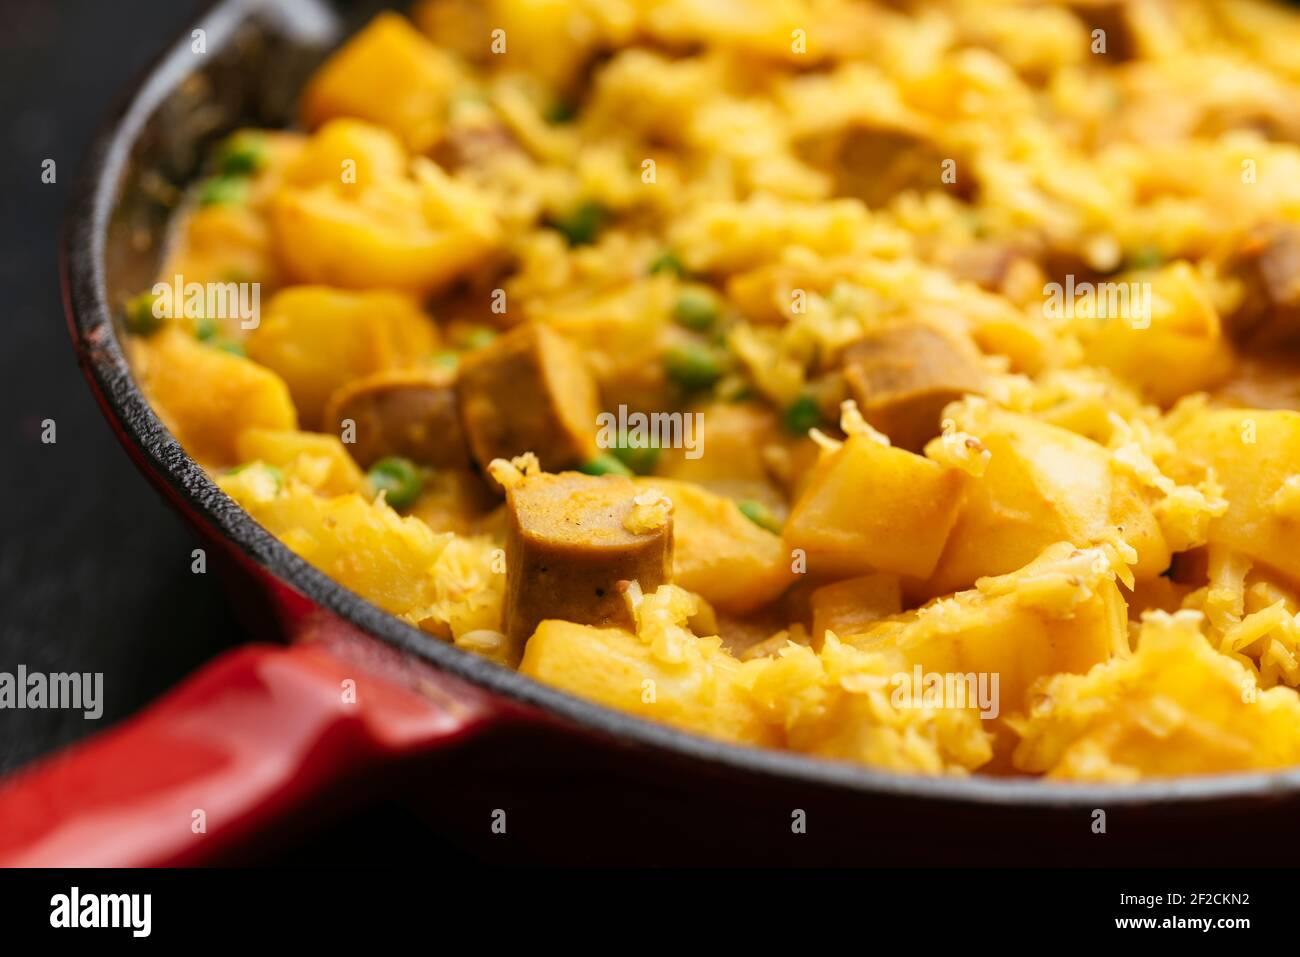 Vegan Hot Dog, Potato, Pea Dinner with Cheesy Sauce Stock Photo